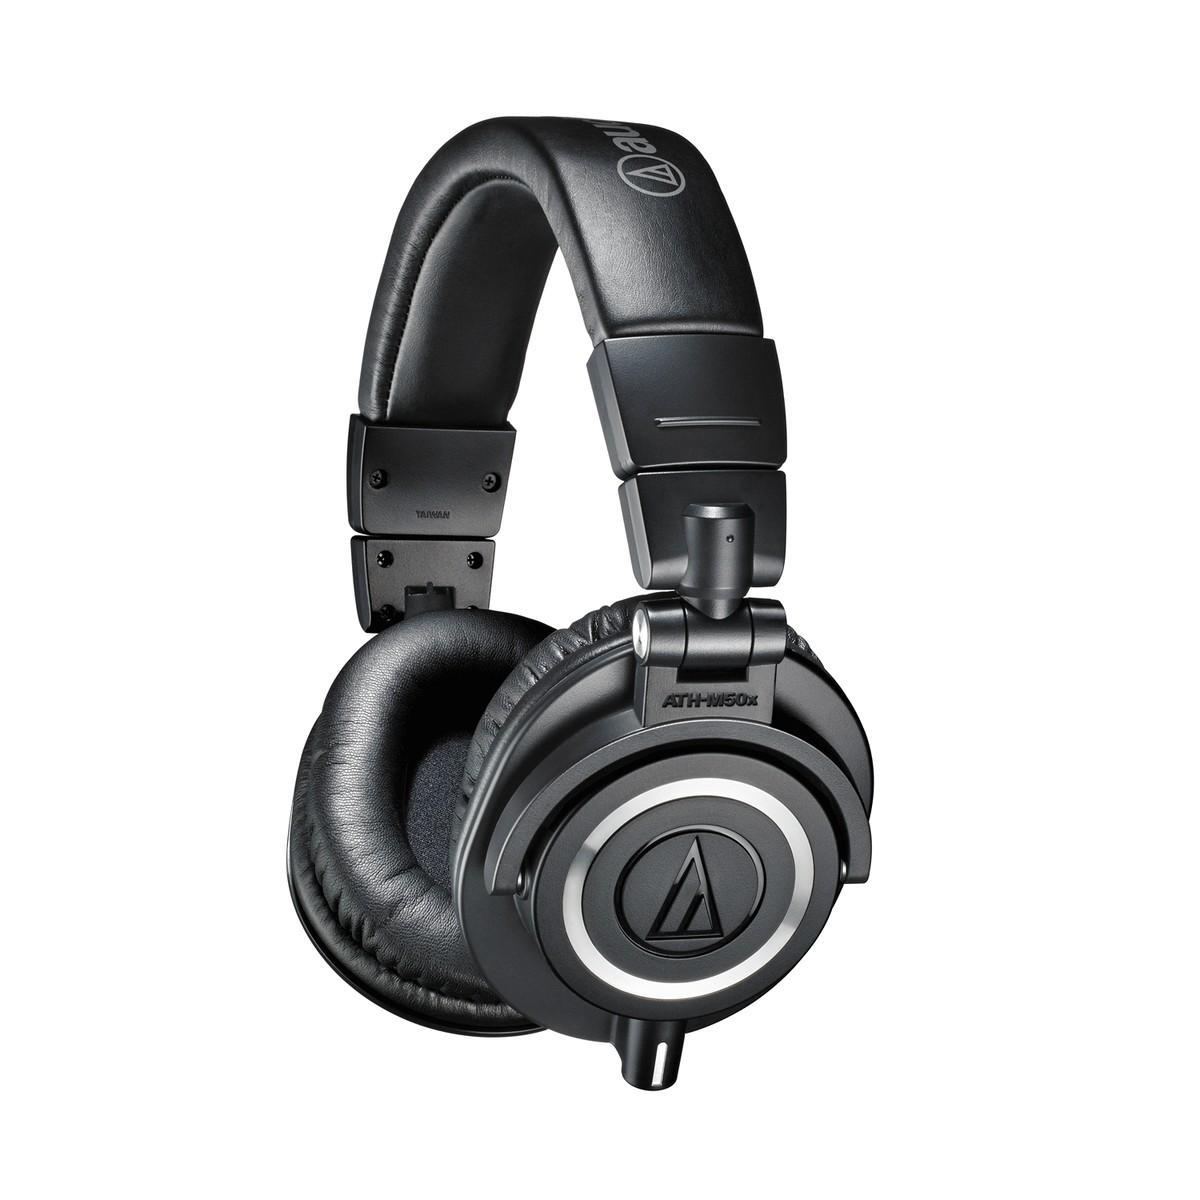 Image of Audio Technica ATH-M50x Professional Monitor Headphones Black